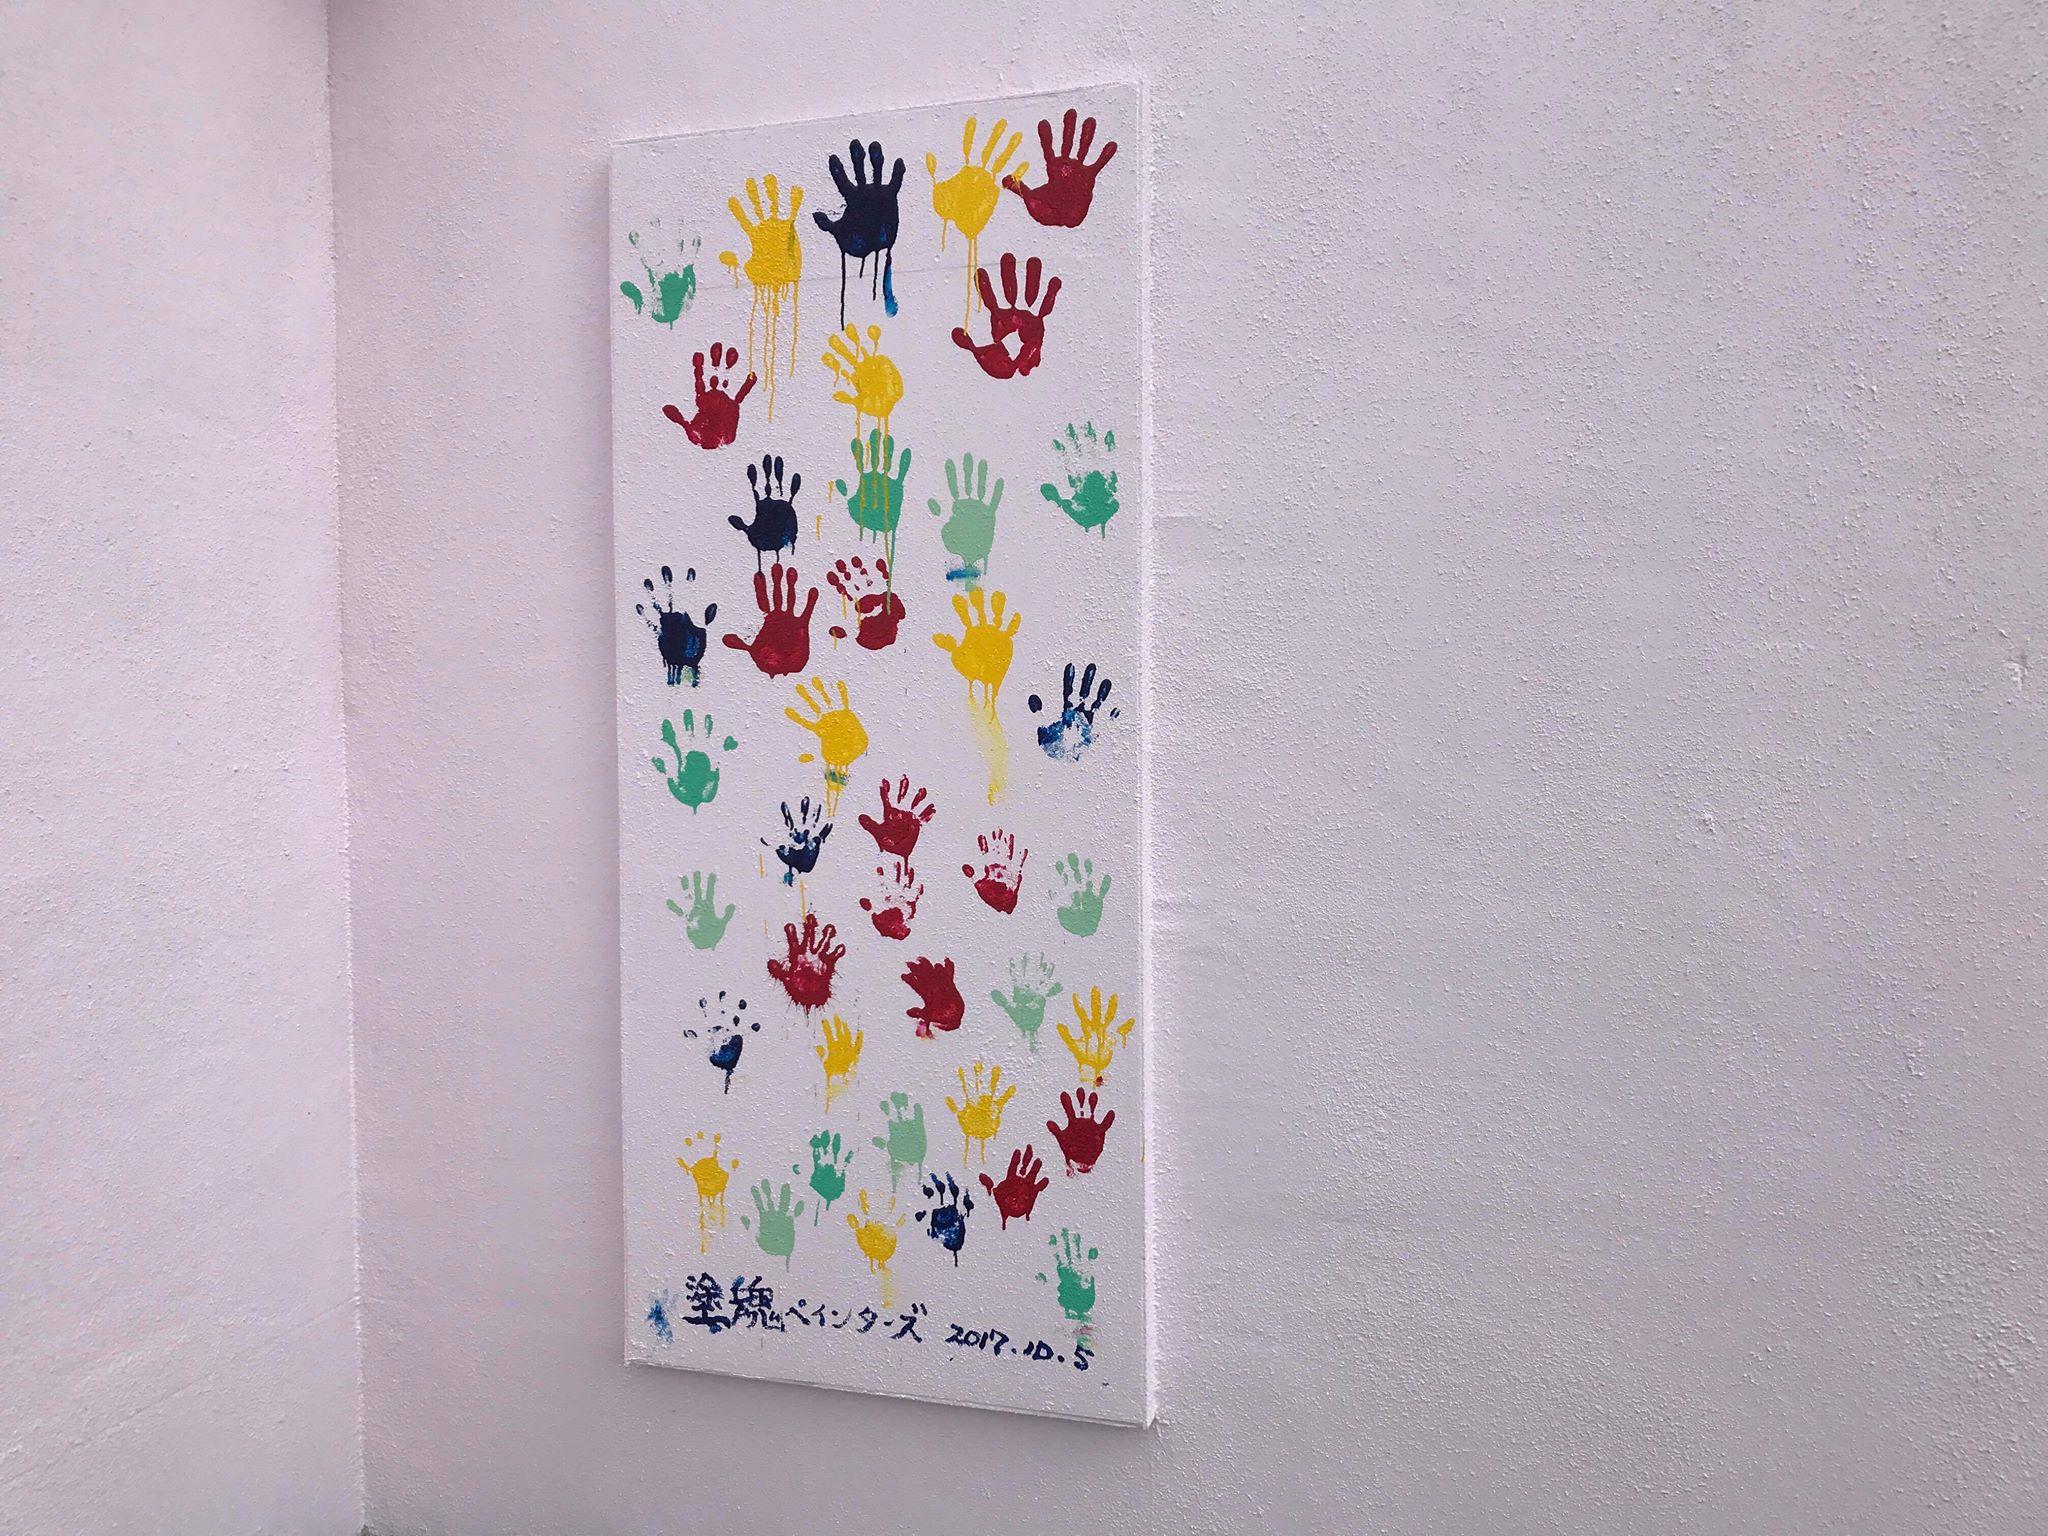 夕張市立ユーパロ幼稚園